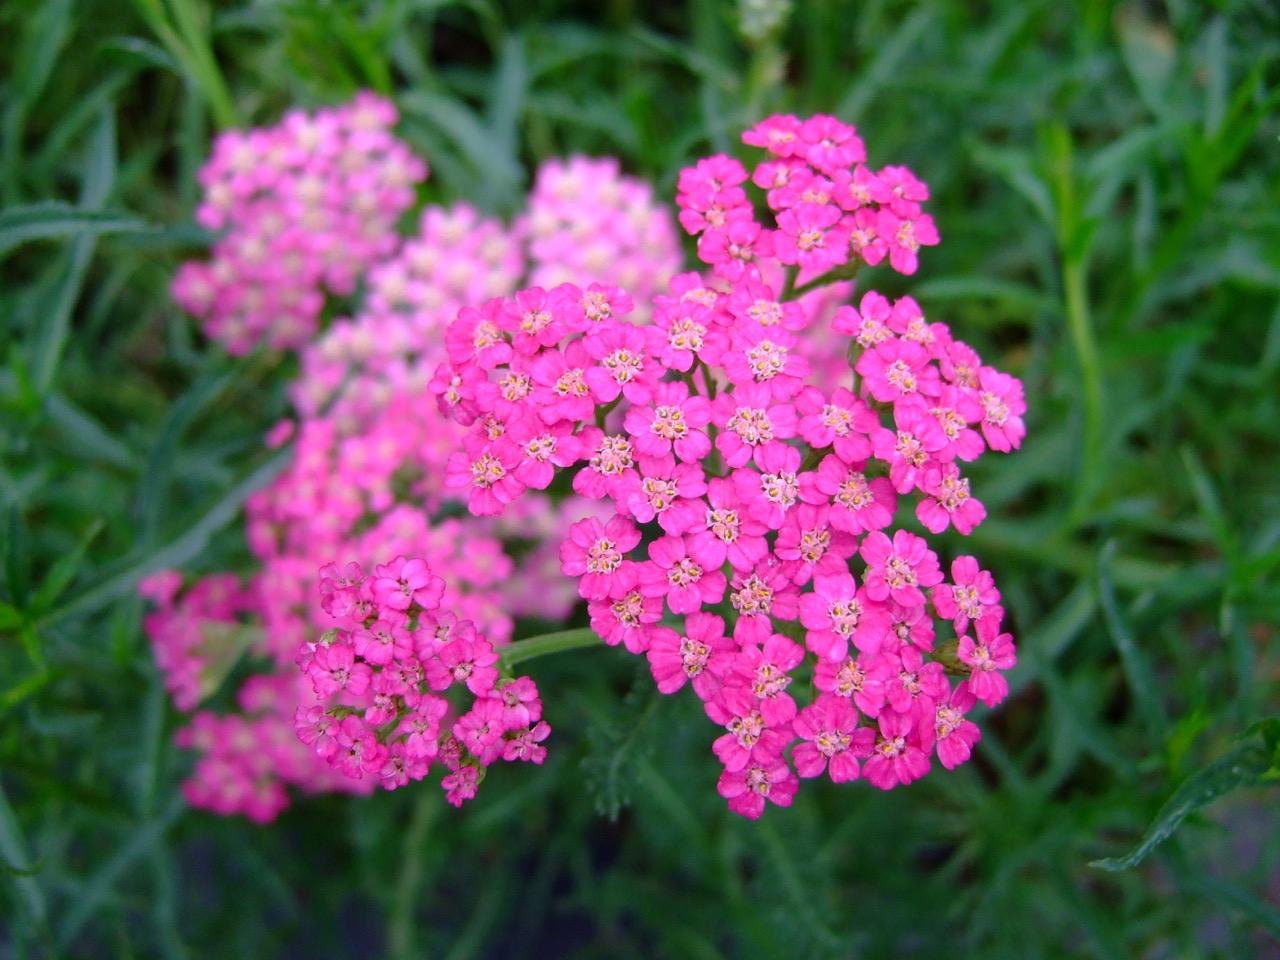 Fiori estivi perenni 28 images achillea millefolium summer wine fiori da giardino perenni - Fiori da giardino estivi ...